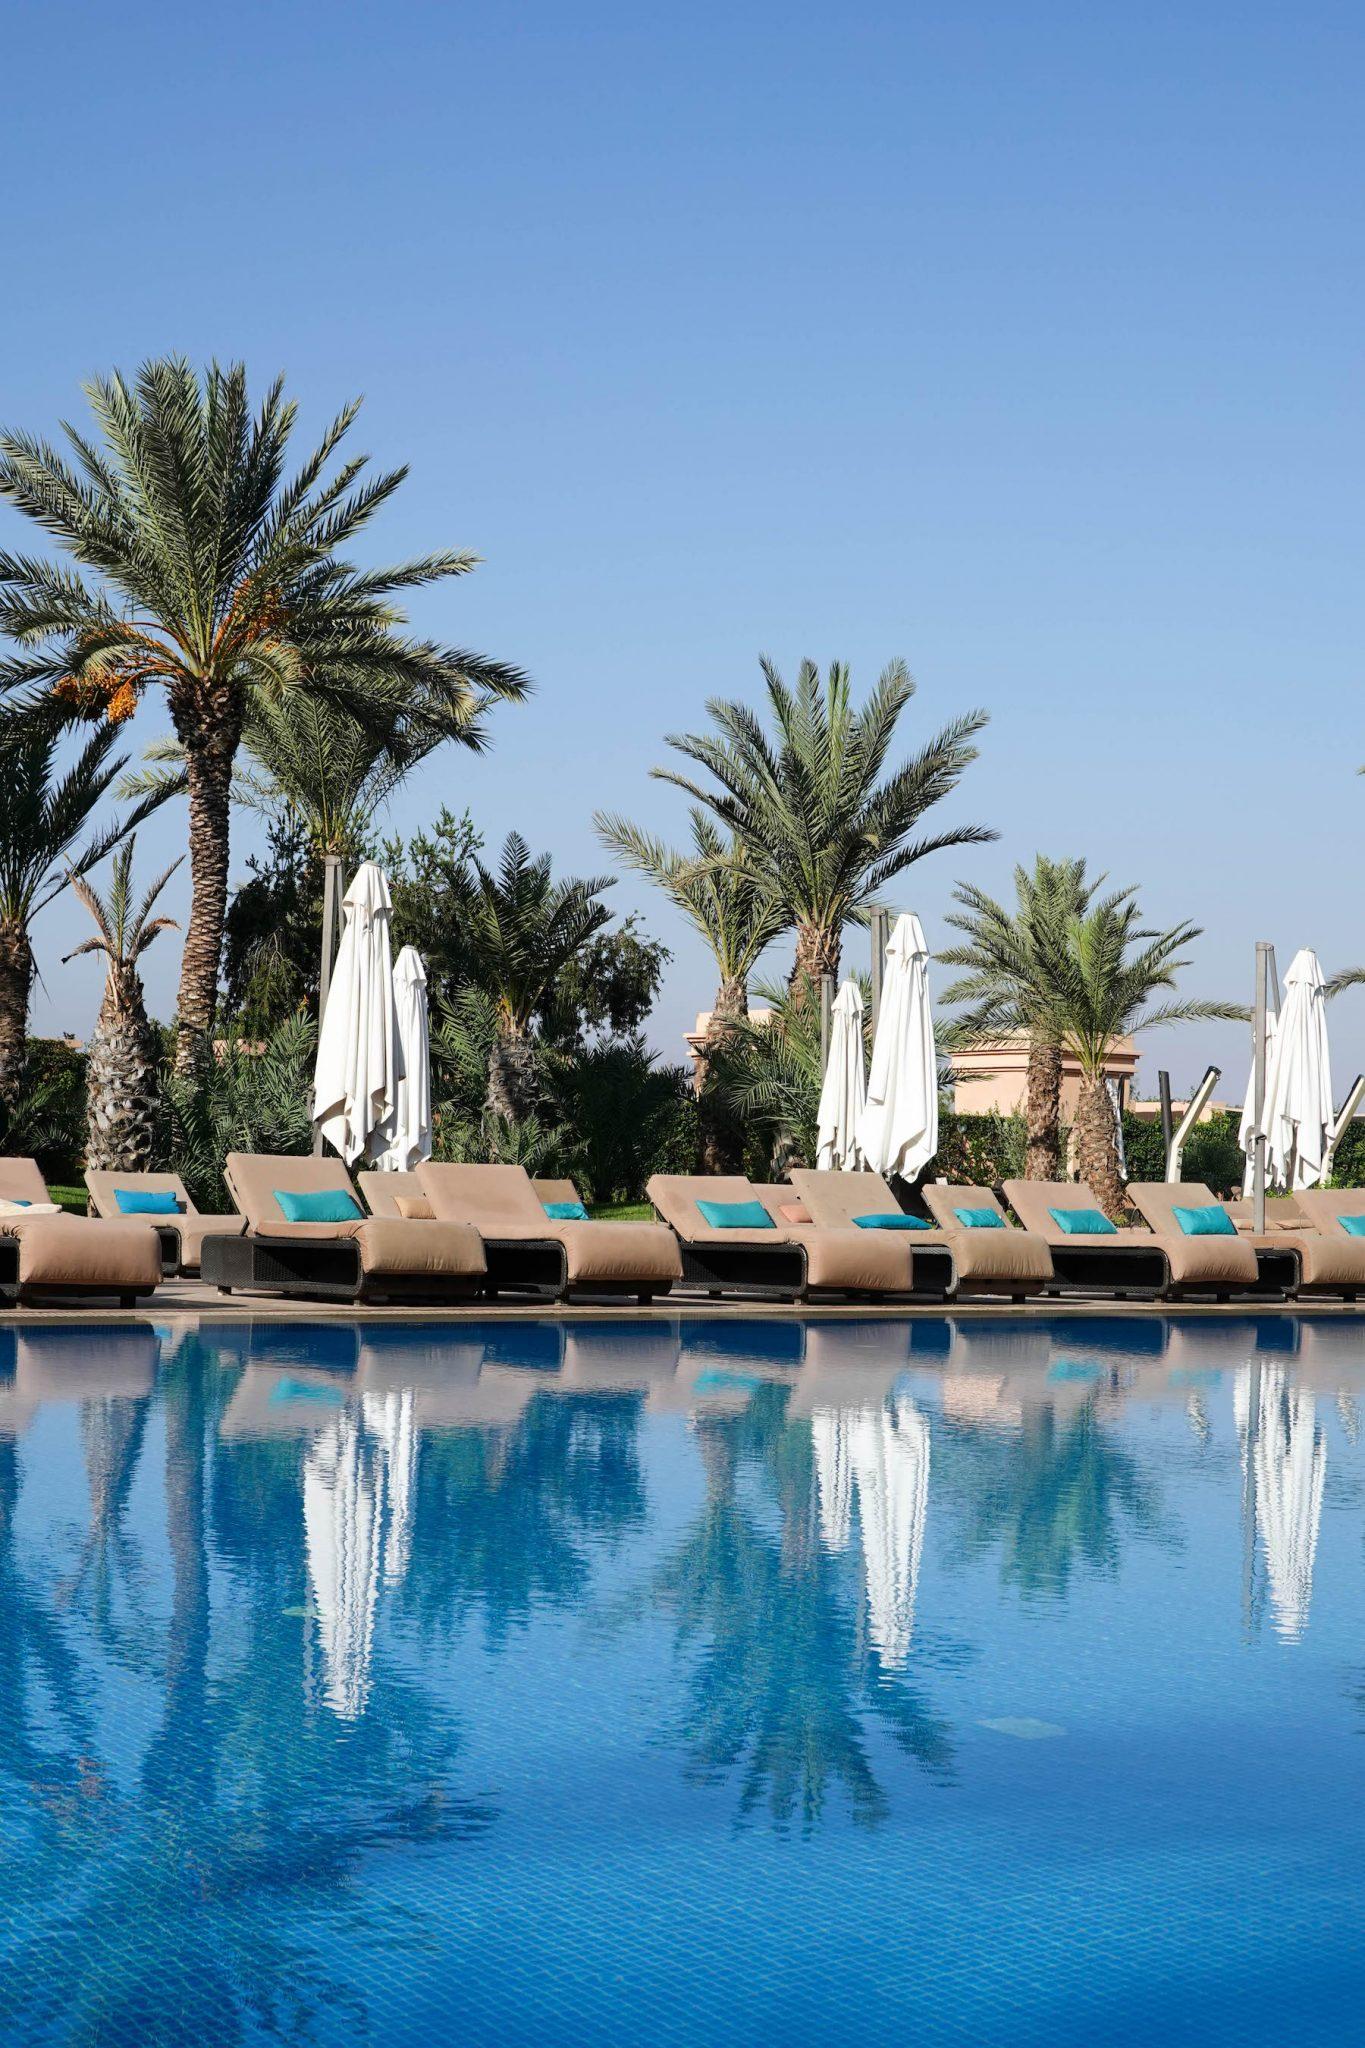 suelovesnyc_hotel_in_marrakesch_movenpick_hotel_mansour_eddahbi_moevenpick_hotel_marrakech_pool